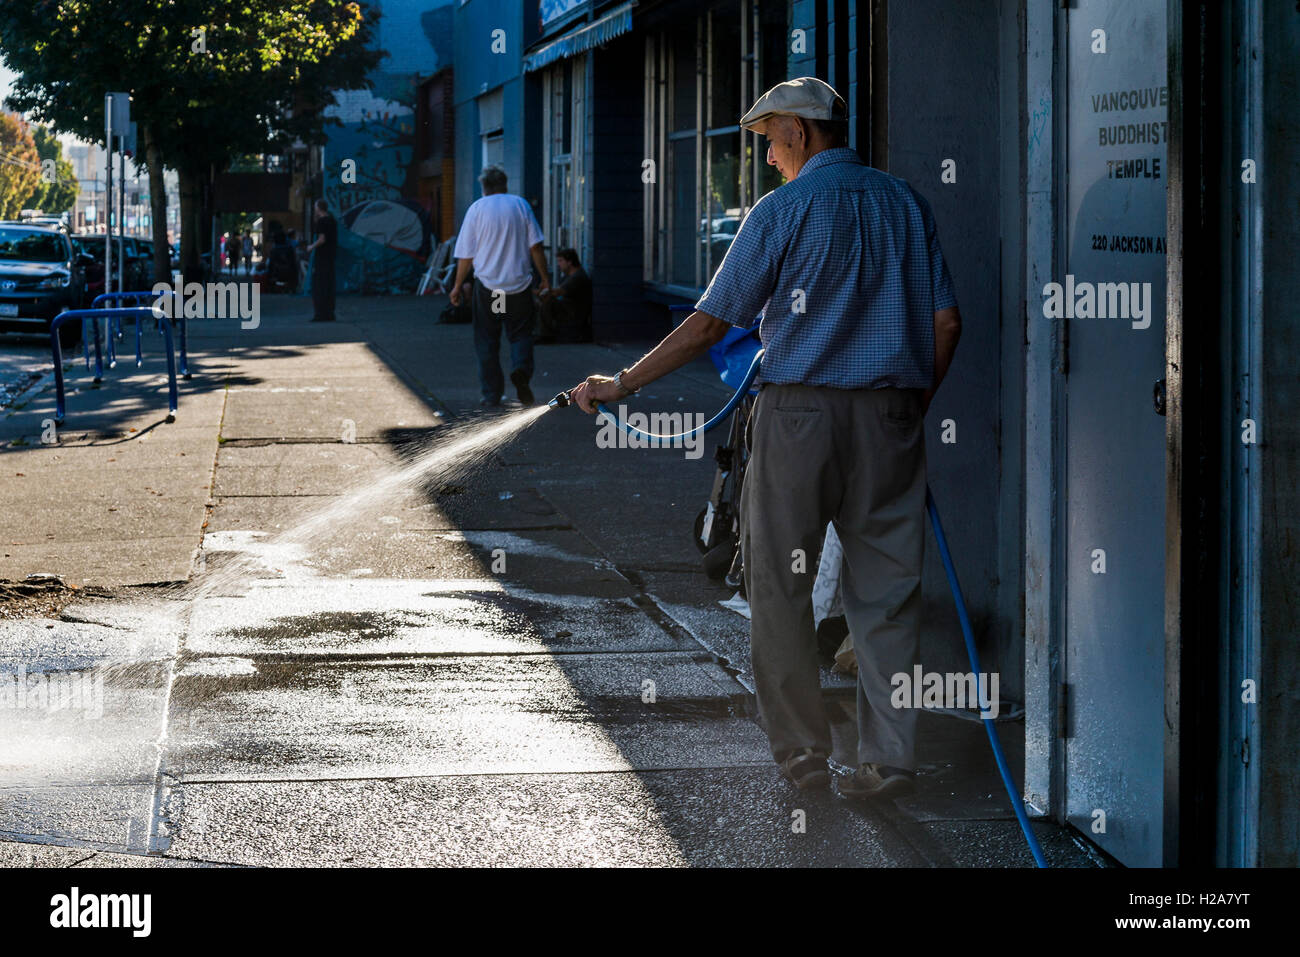 Mann Reinigung Bürgersteig mit Schlauch, Downtown Eastside, Vancouver, Britisch-Kolumbien, Kanada Stockbild